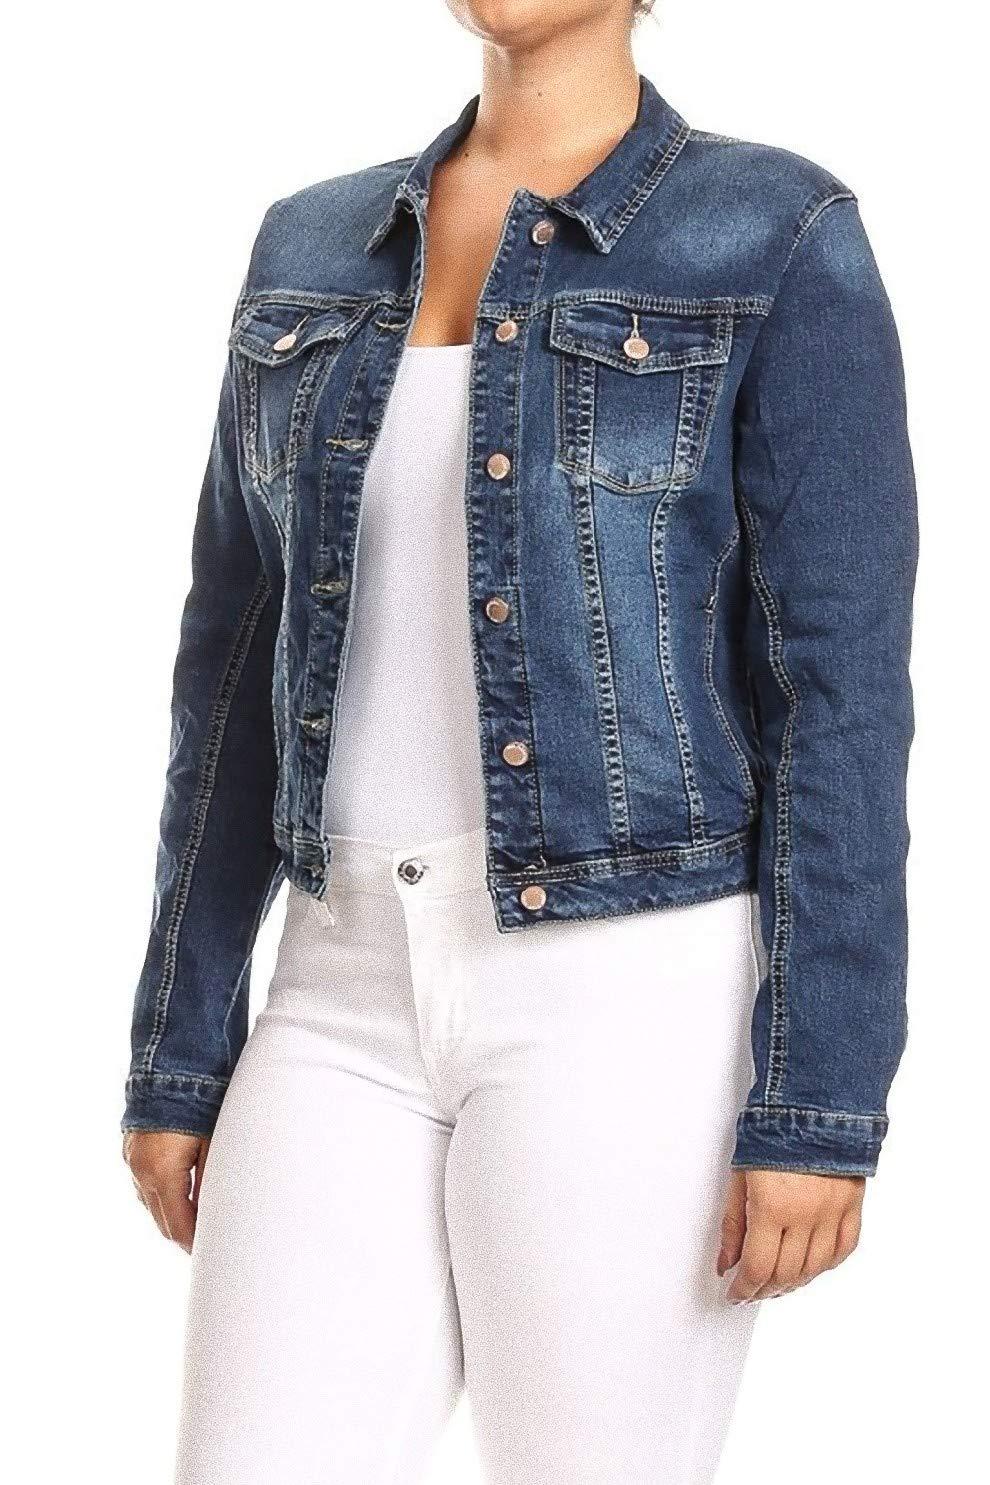 Women's Junior Plus Size, Premium Denim Jackets Long Sleeve Loose Jean Coats in M. Blue Size 3XL